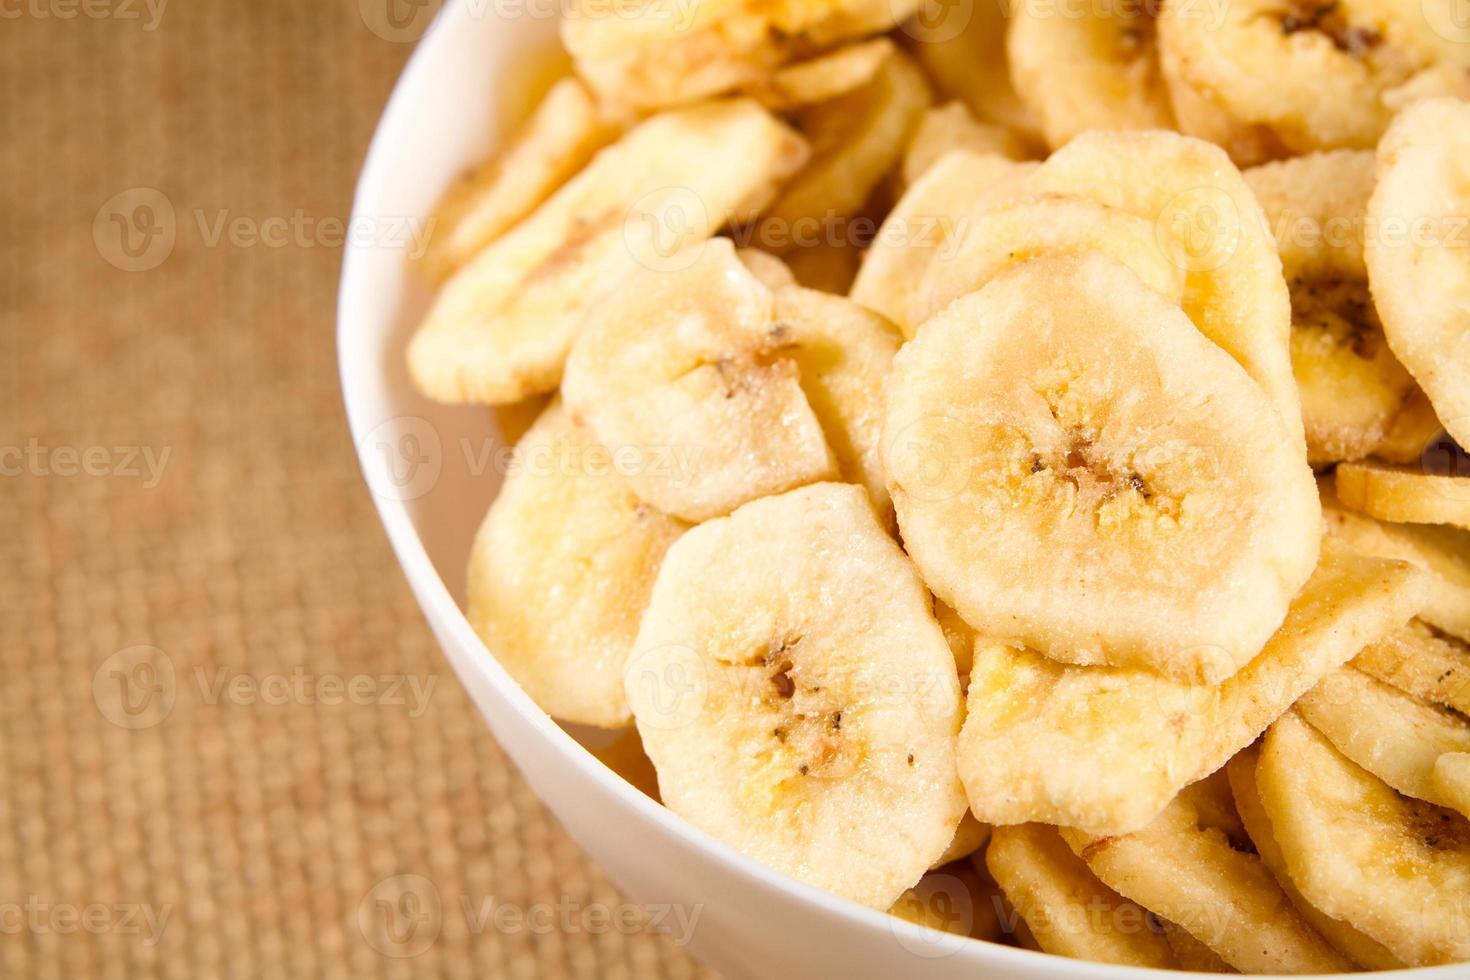 chips a la banane photo